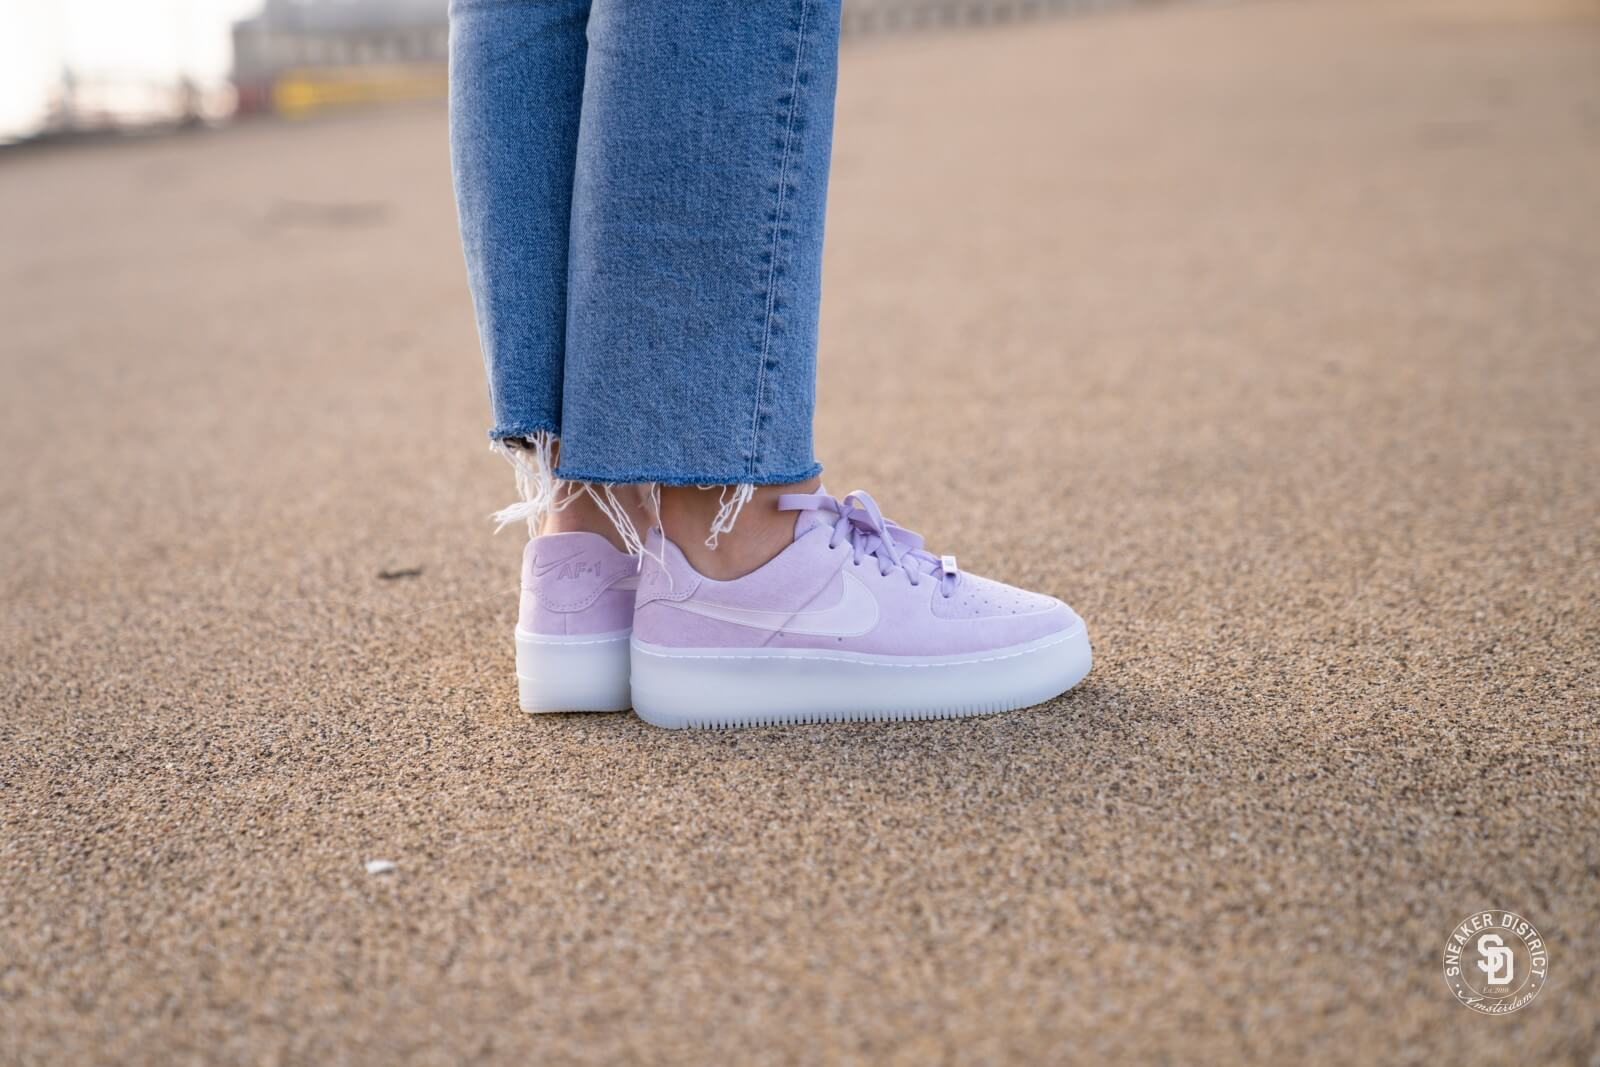 Nike Air Force 1 Sage Low LX Women's Shoe Nikecom | Nike